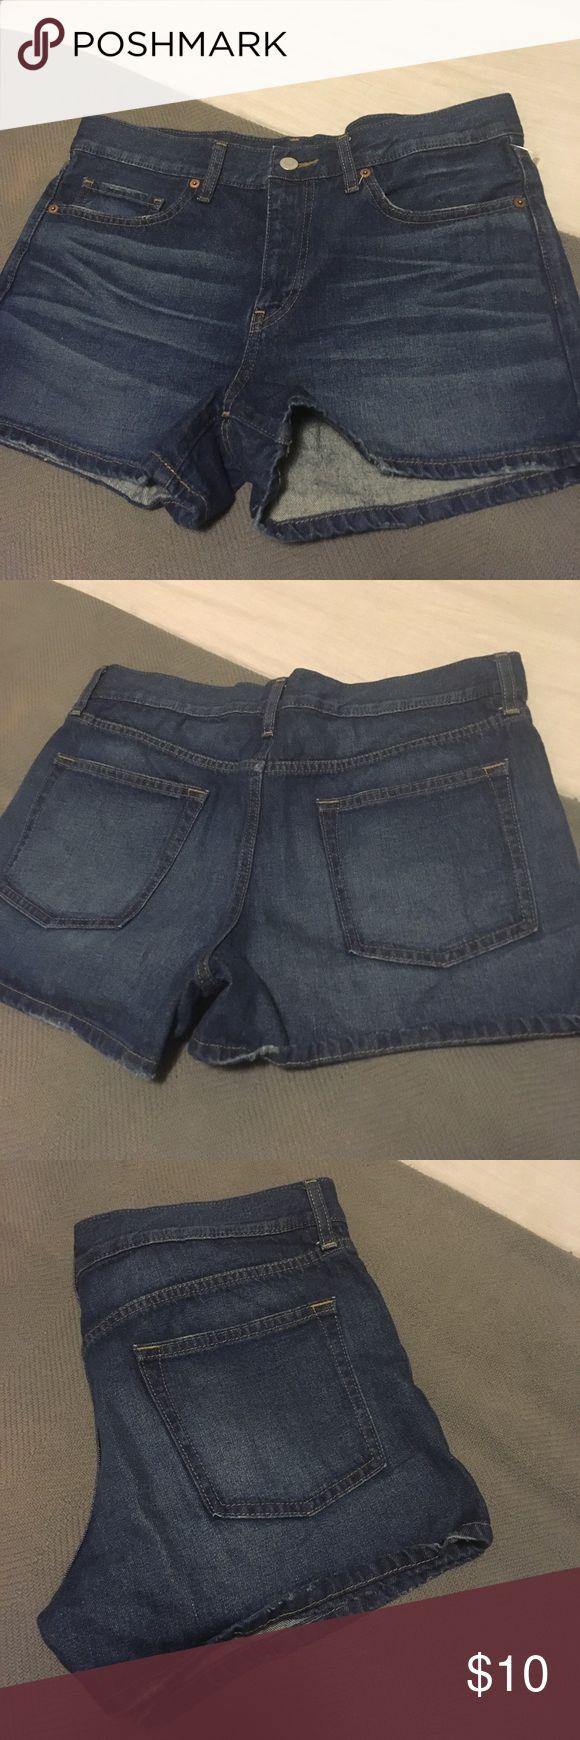 Dark denim shorts Brand new WOT threw tag can't find Uniqlo Shorts Jean Shorts